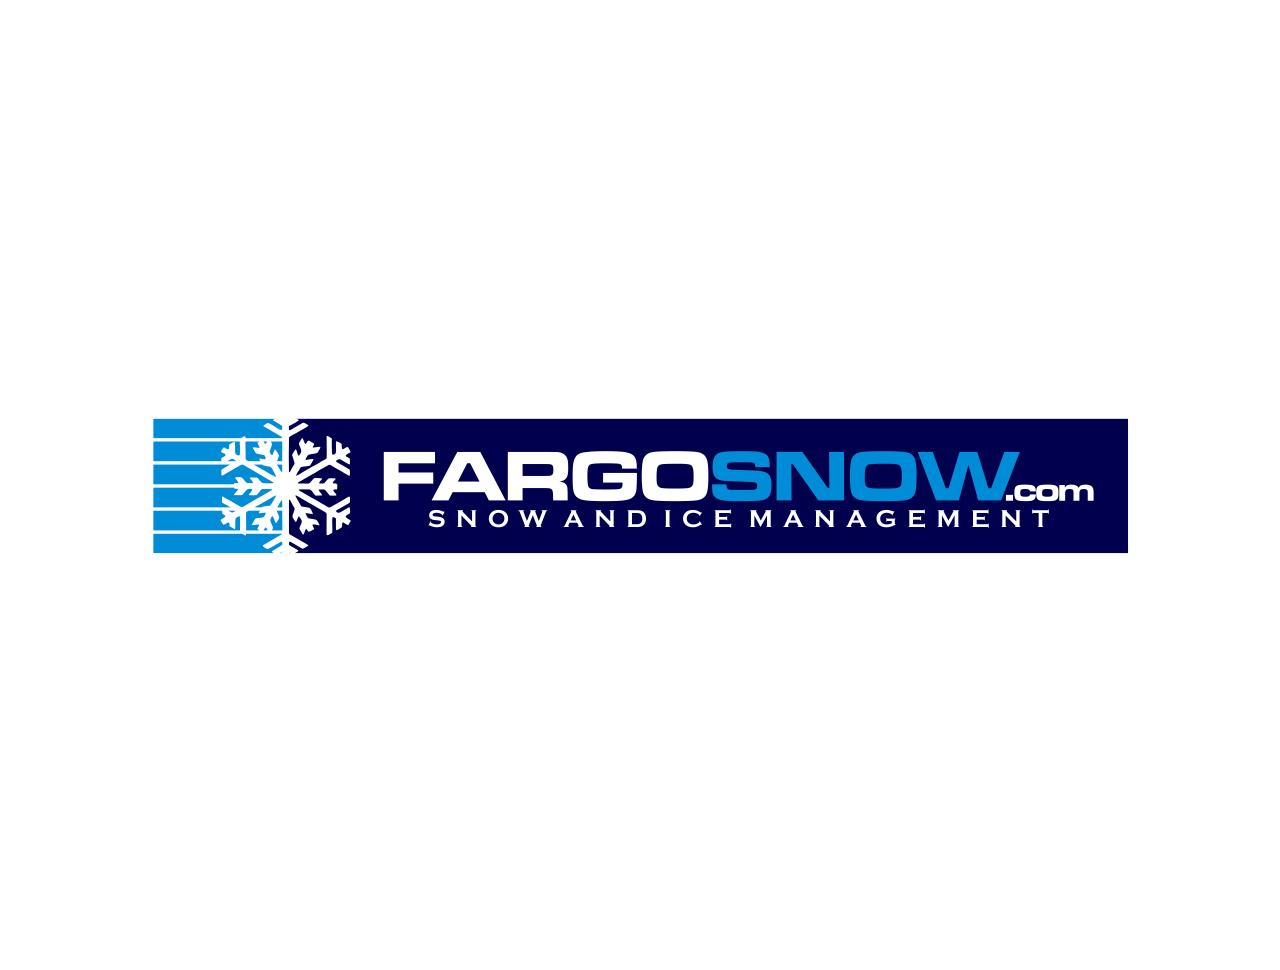 Fargo Snow